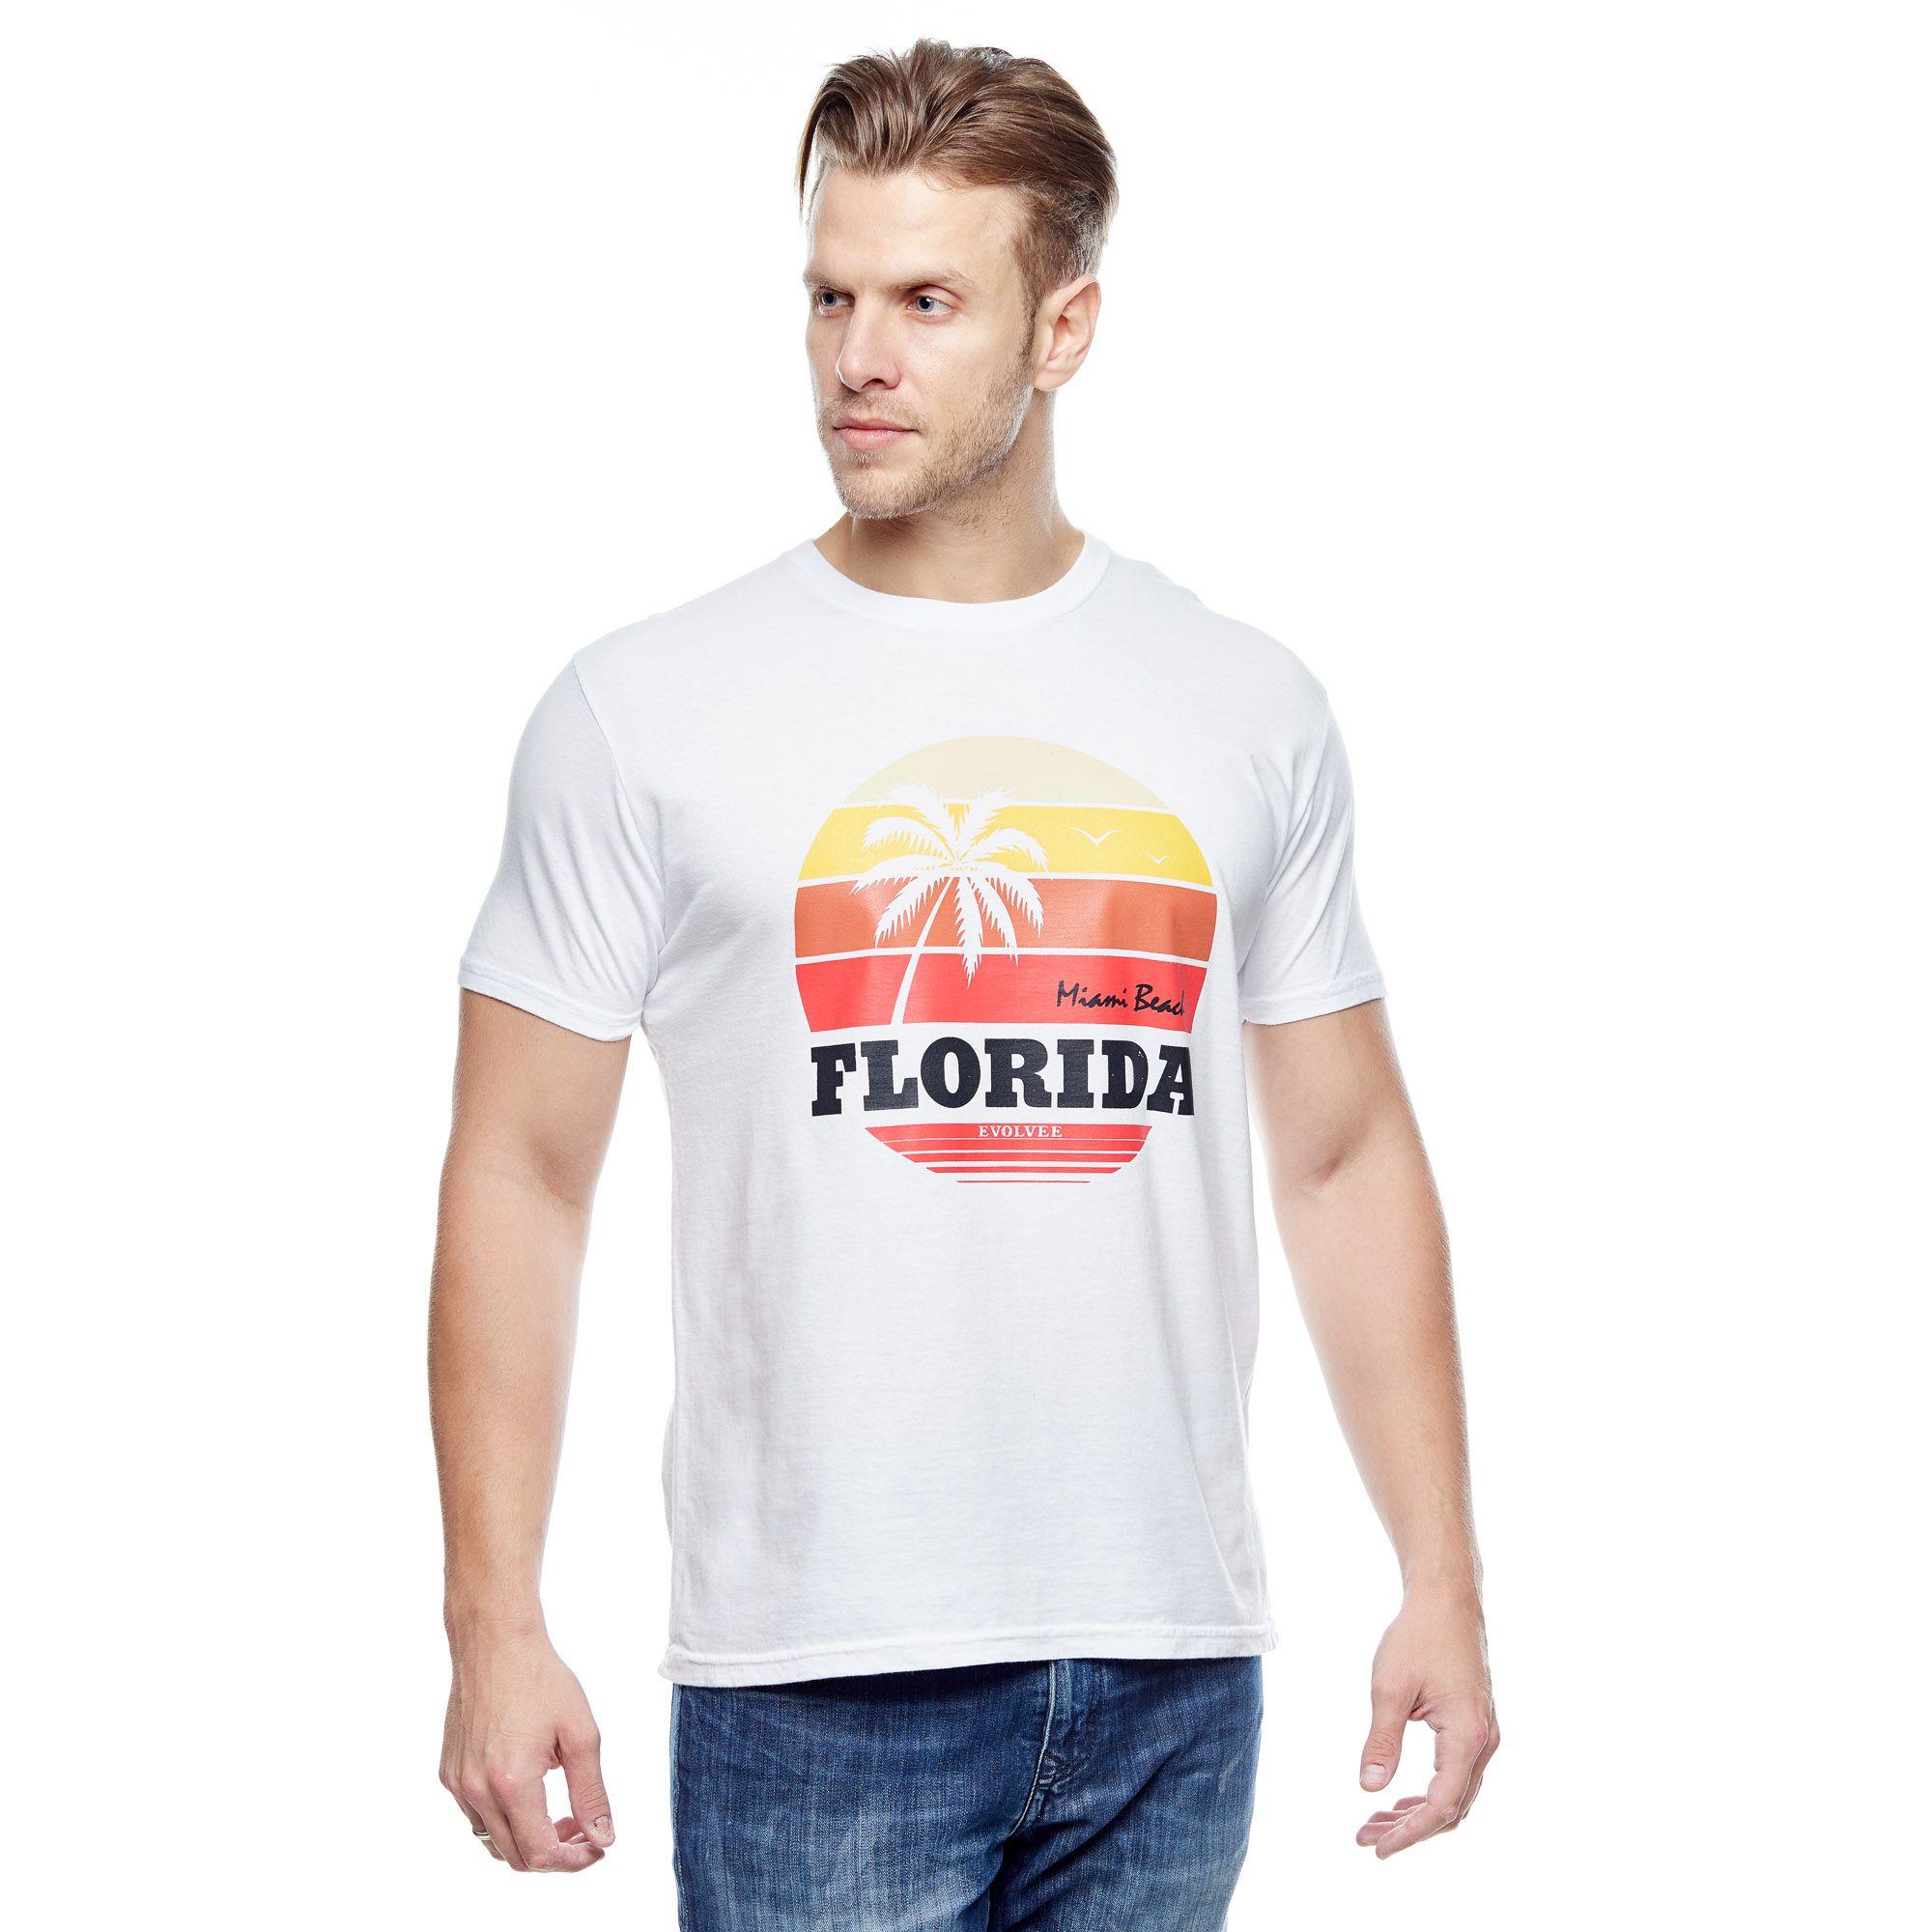 Camiseta Florida Masculina Evolvee